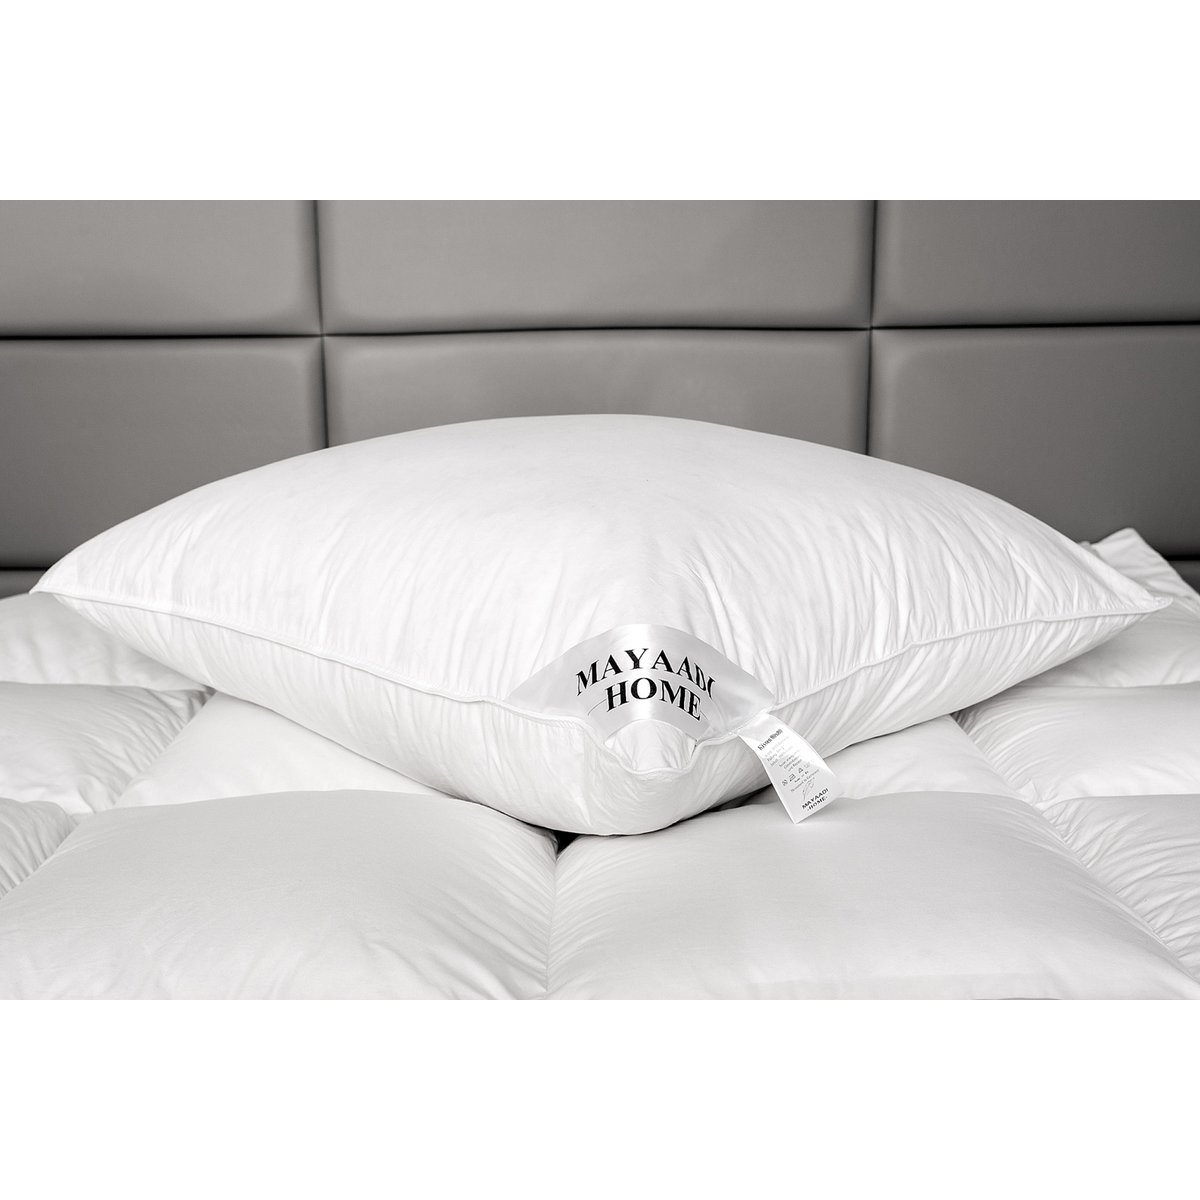 hs7 kopfkissen daunen 100 natur federn daunenkissen kissen 80x80 cm1 37 90. Black Bedroom Furniture Sets. Home Design Ideas